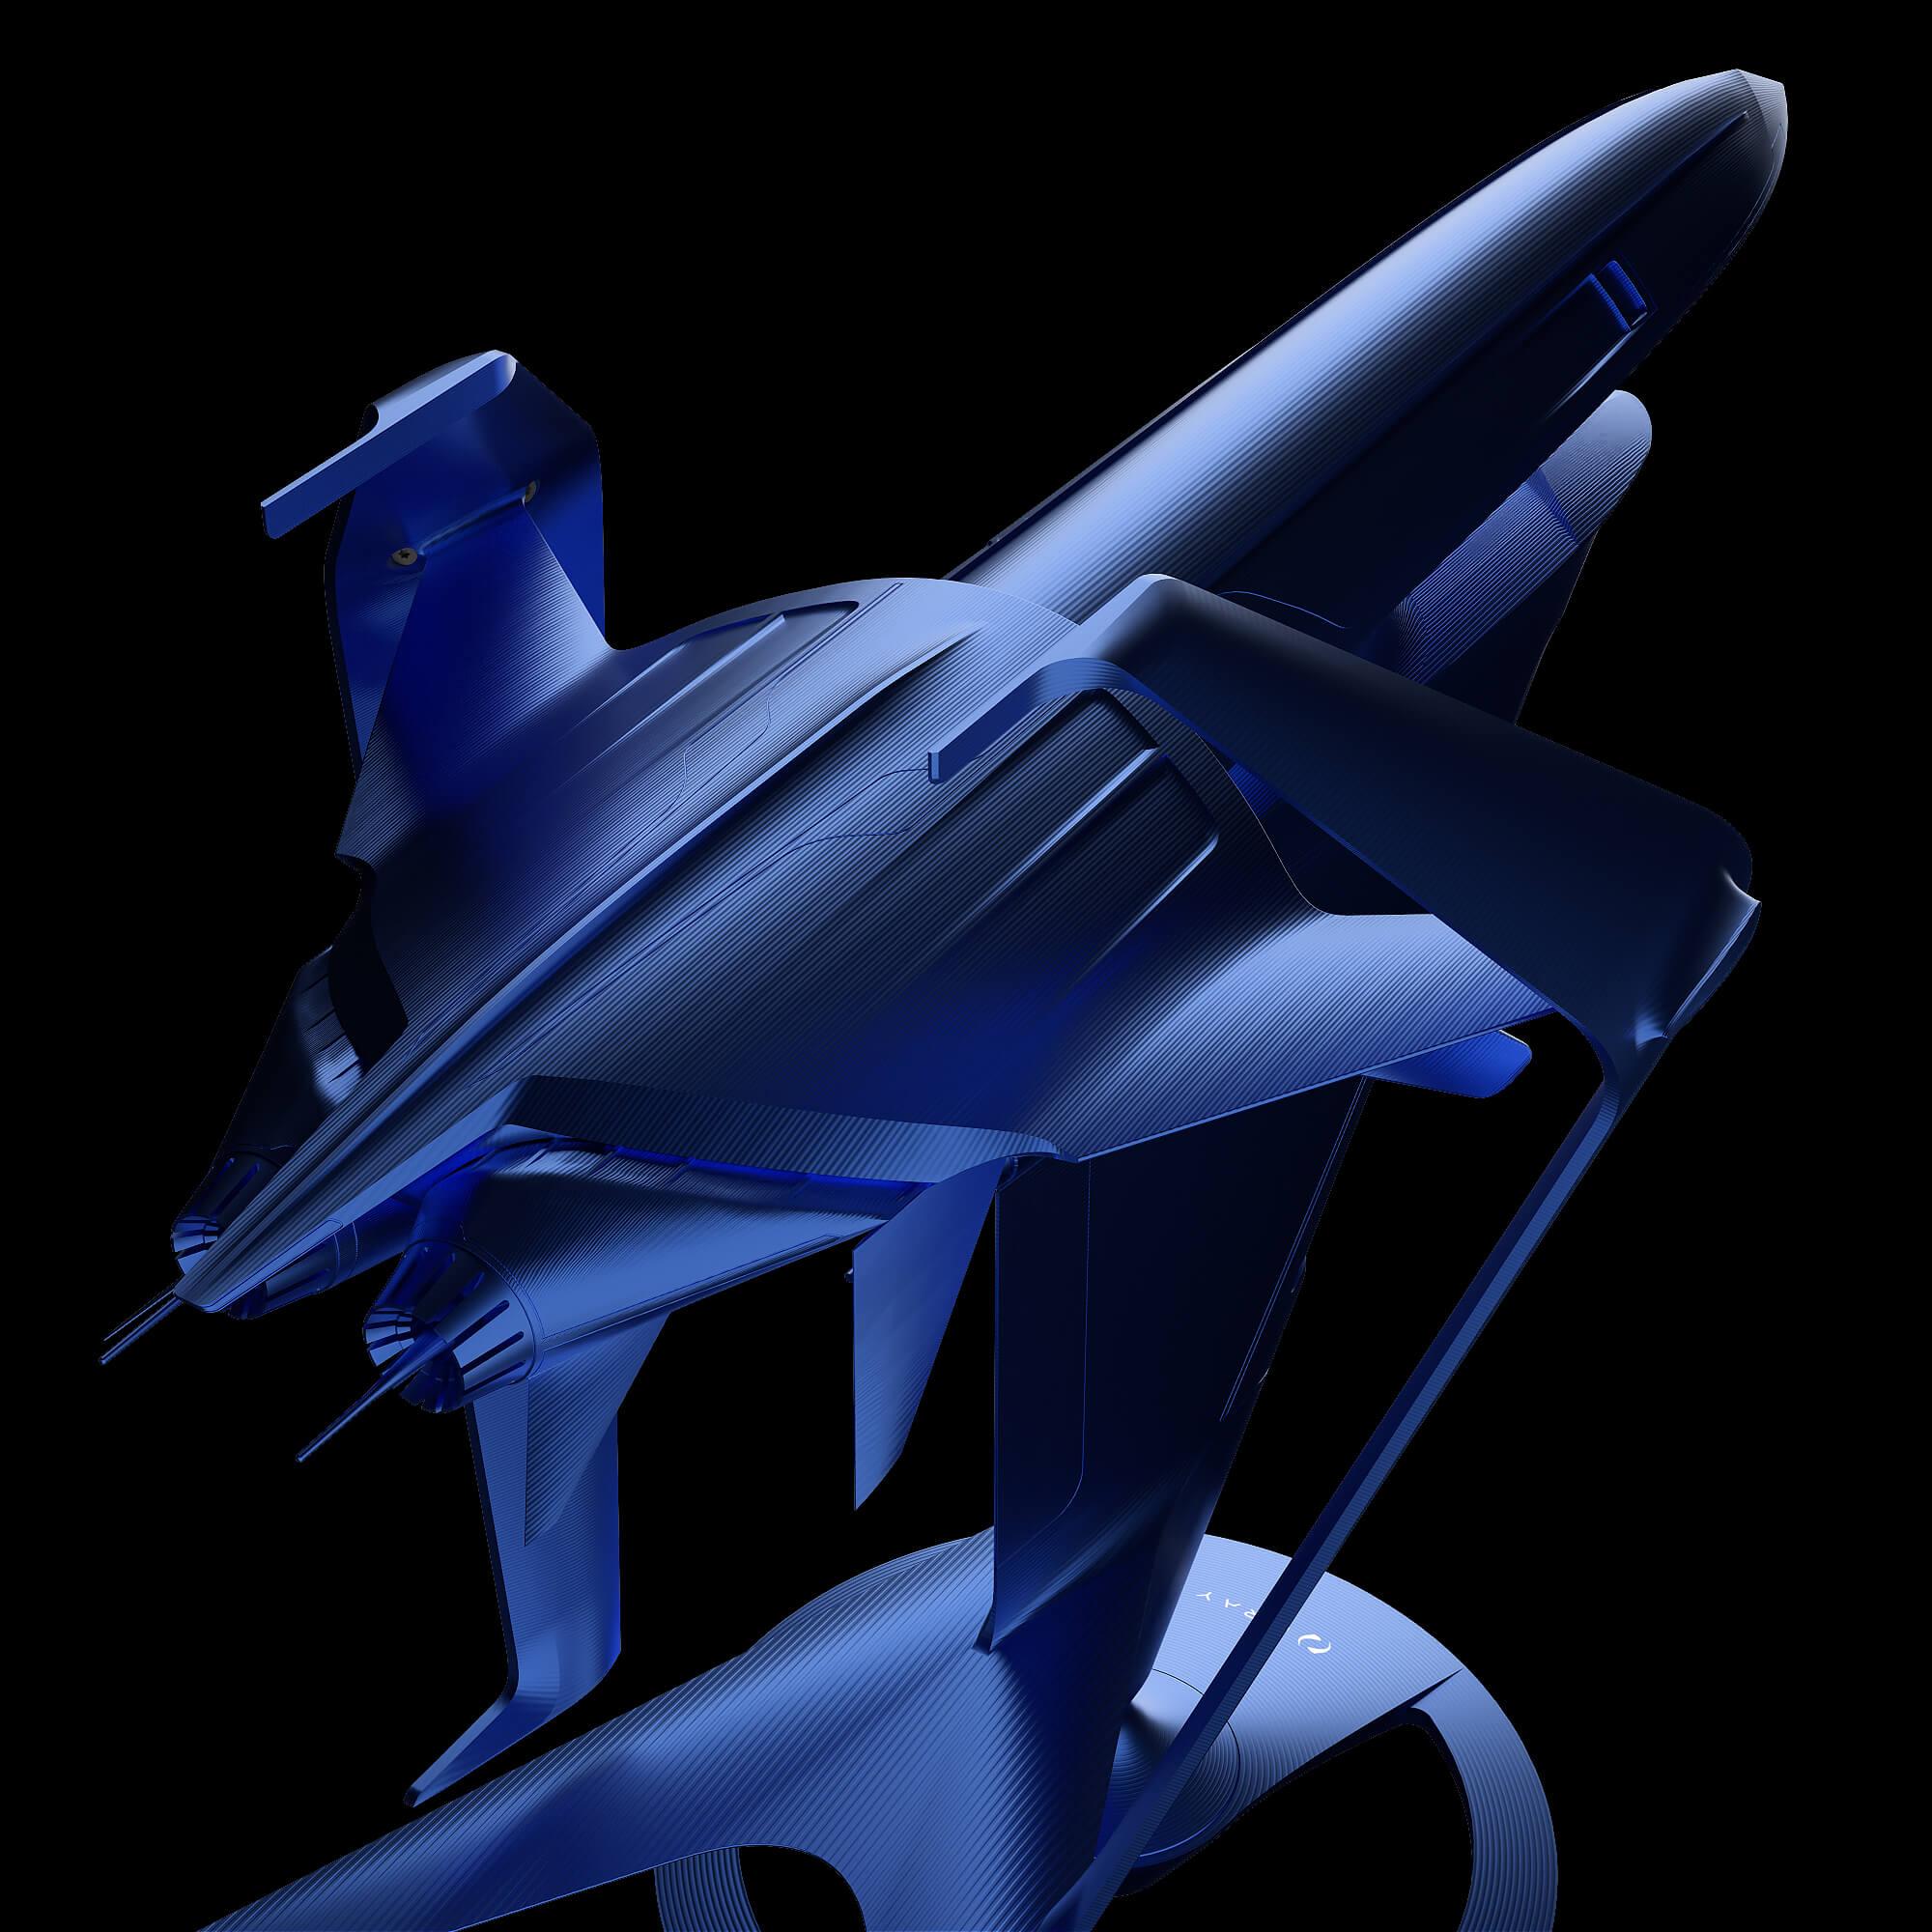 graycraft1-3 blue aluminium spaceship art sculpture